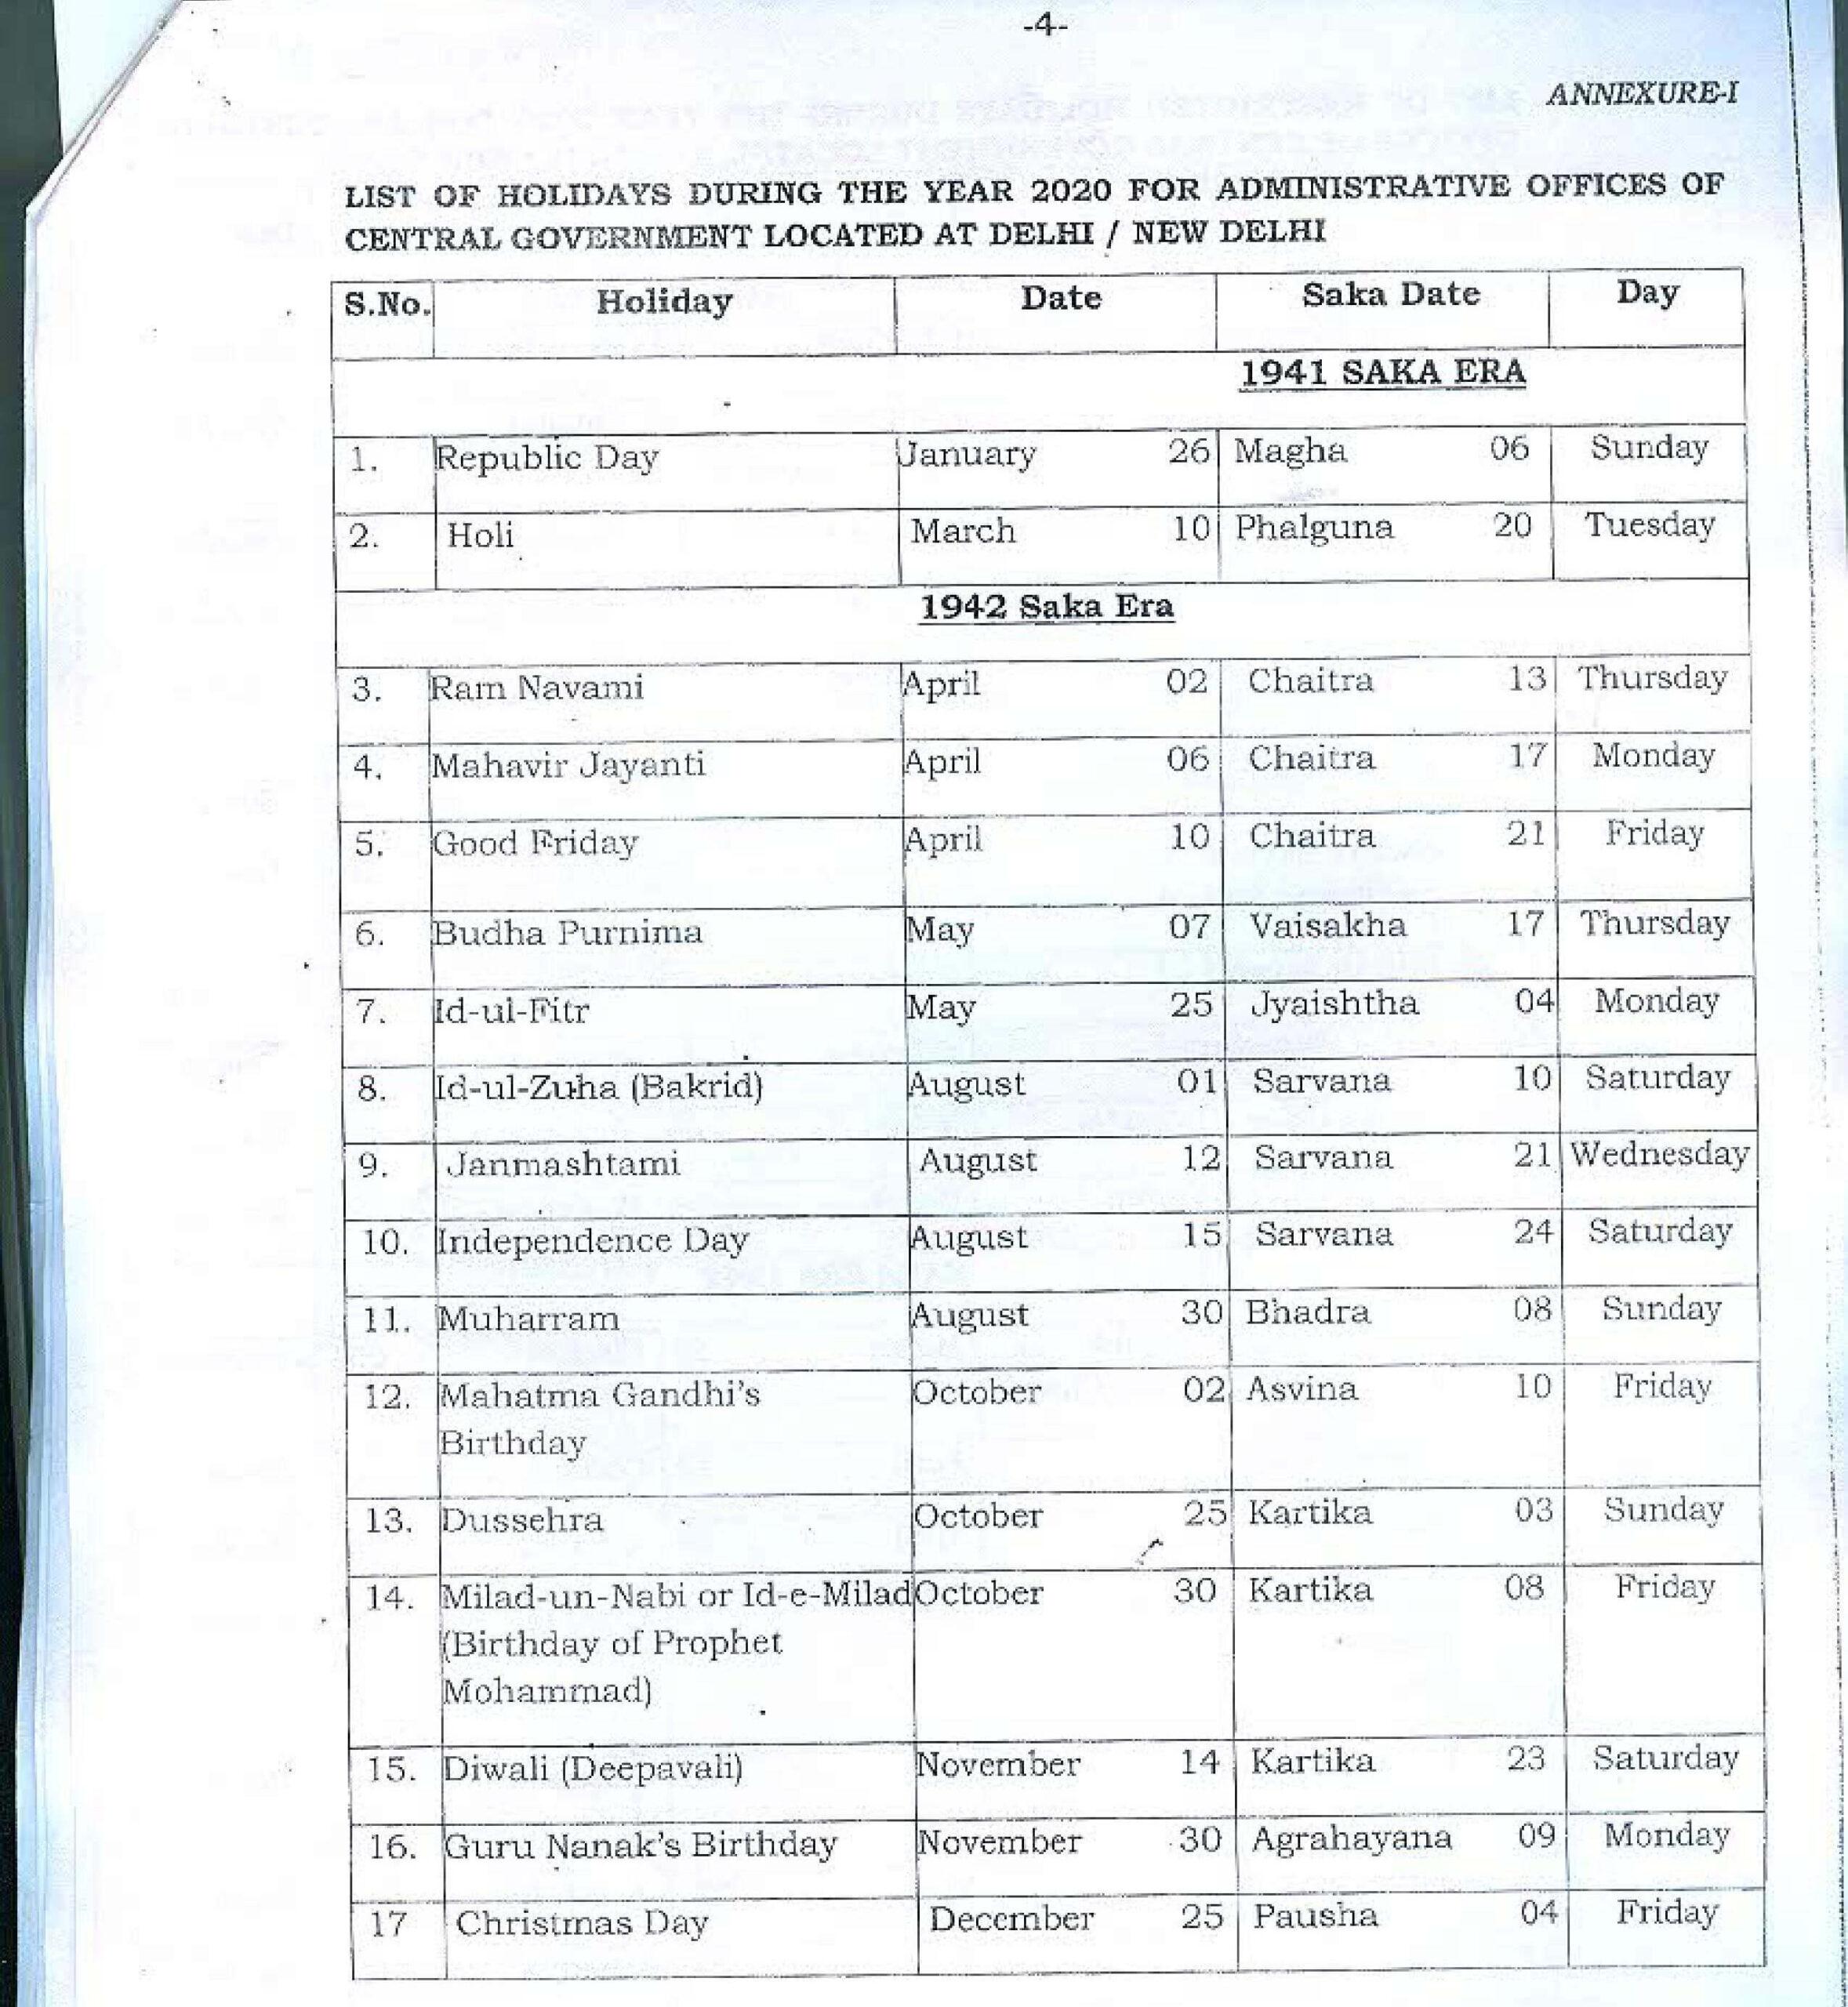 Bihar Govt.calendar 2020 | Calendar For Planning regarding Bihar Sarkar Holiday Calendar